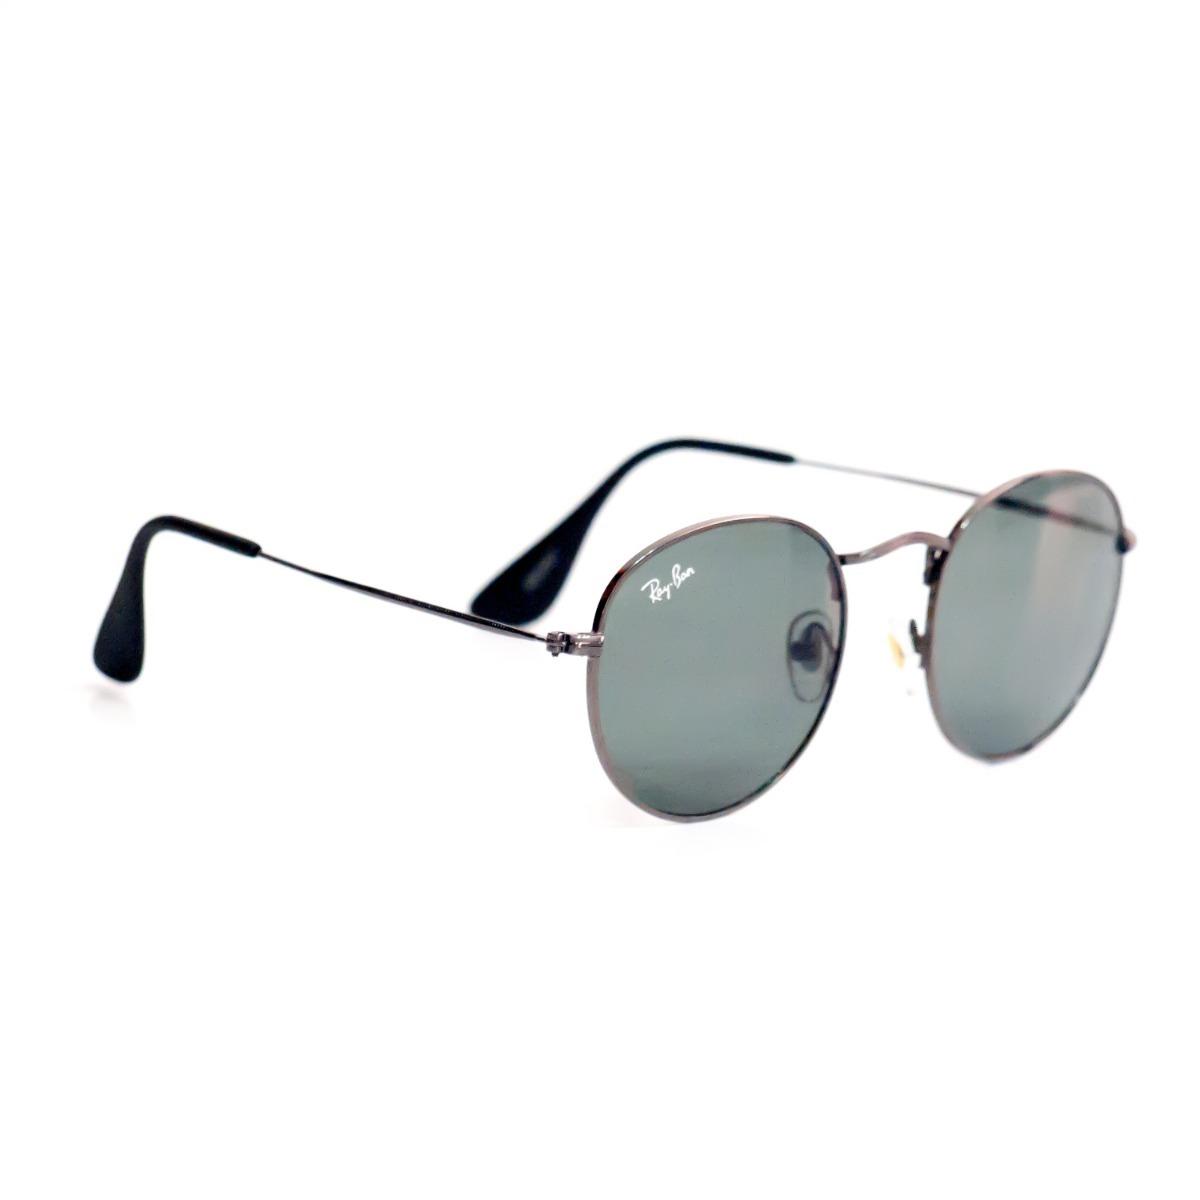 fb65f69620 Gafas De Sol Rayban Round Metal - Jhon Lenon Harry Potter - $ 59.000 ...